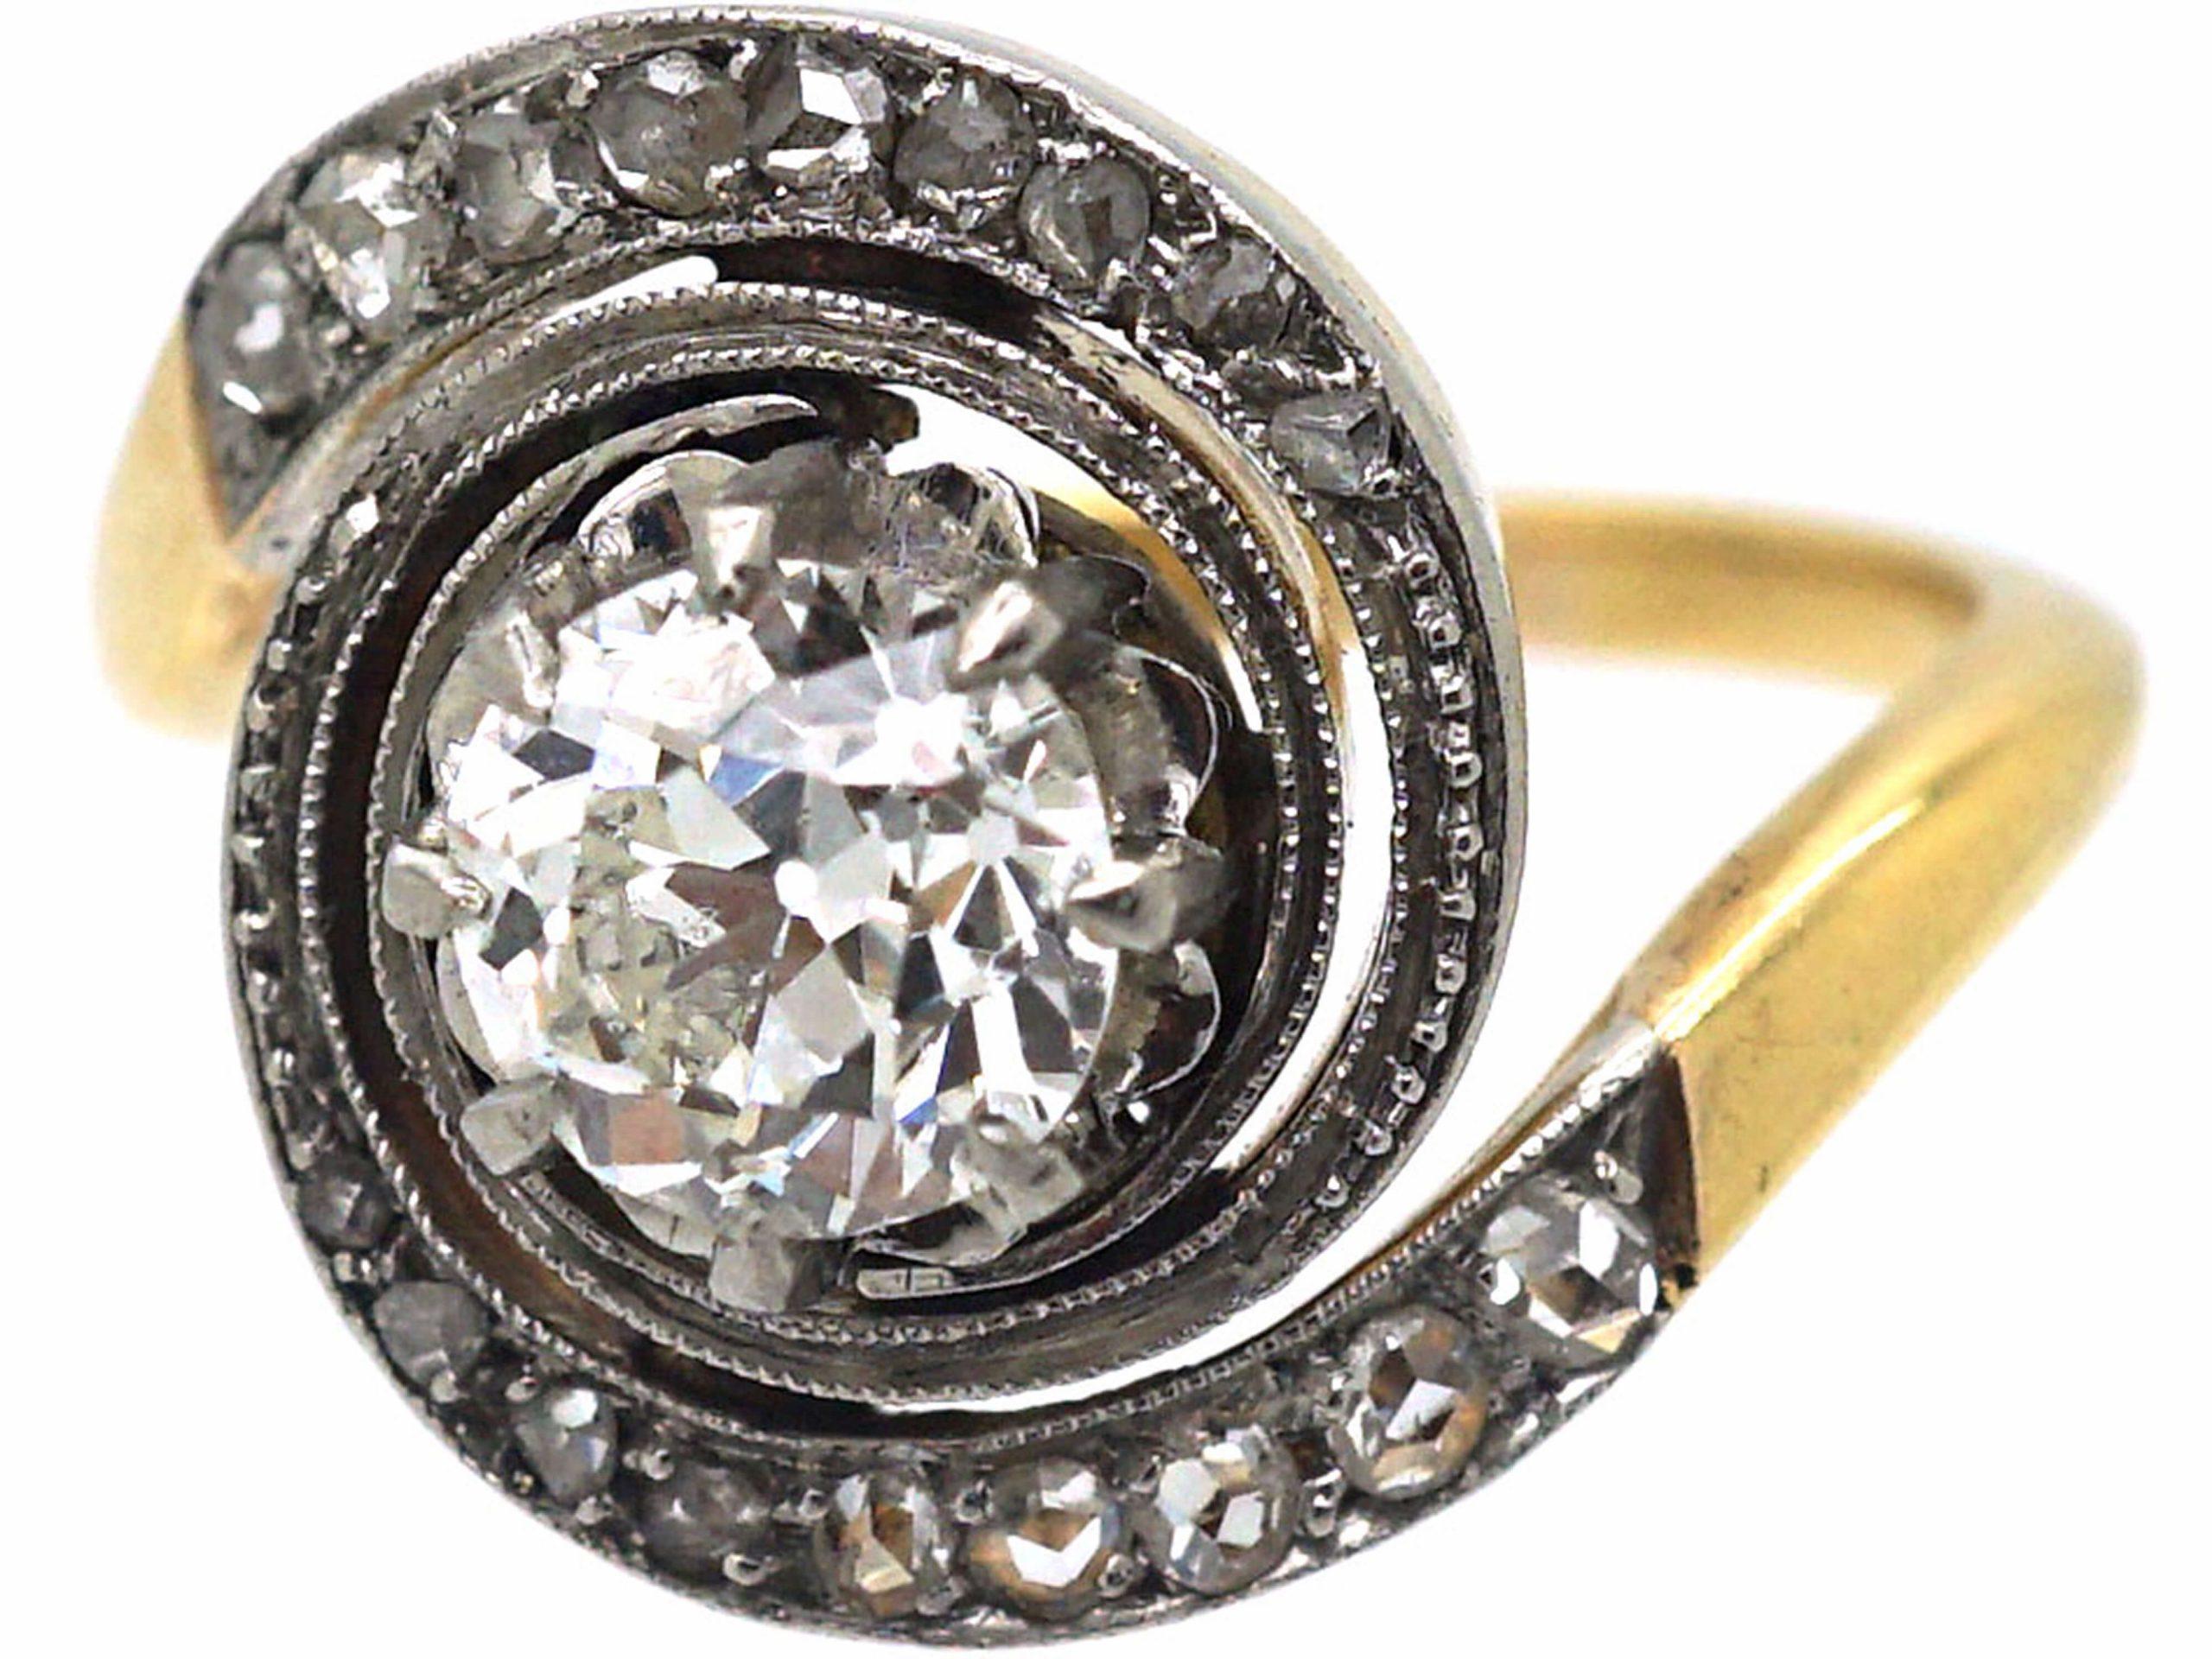 French Art Nouveau 18ct Gold & Platinum, Catherine Wheel Design Diamond Set Ring